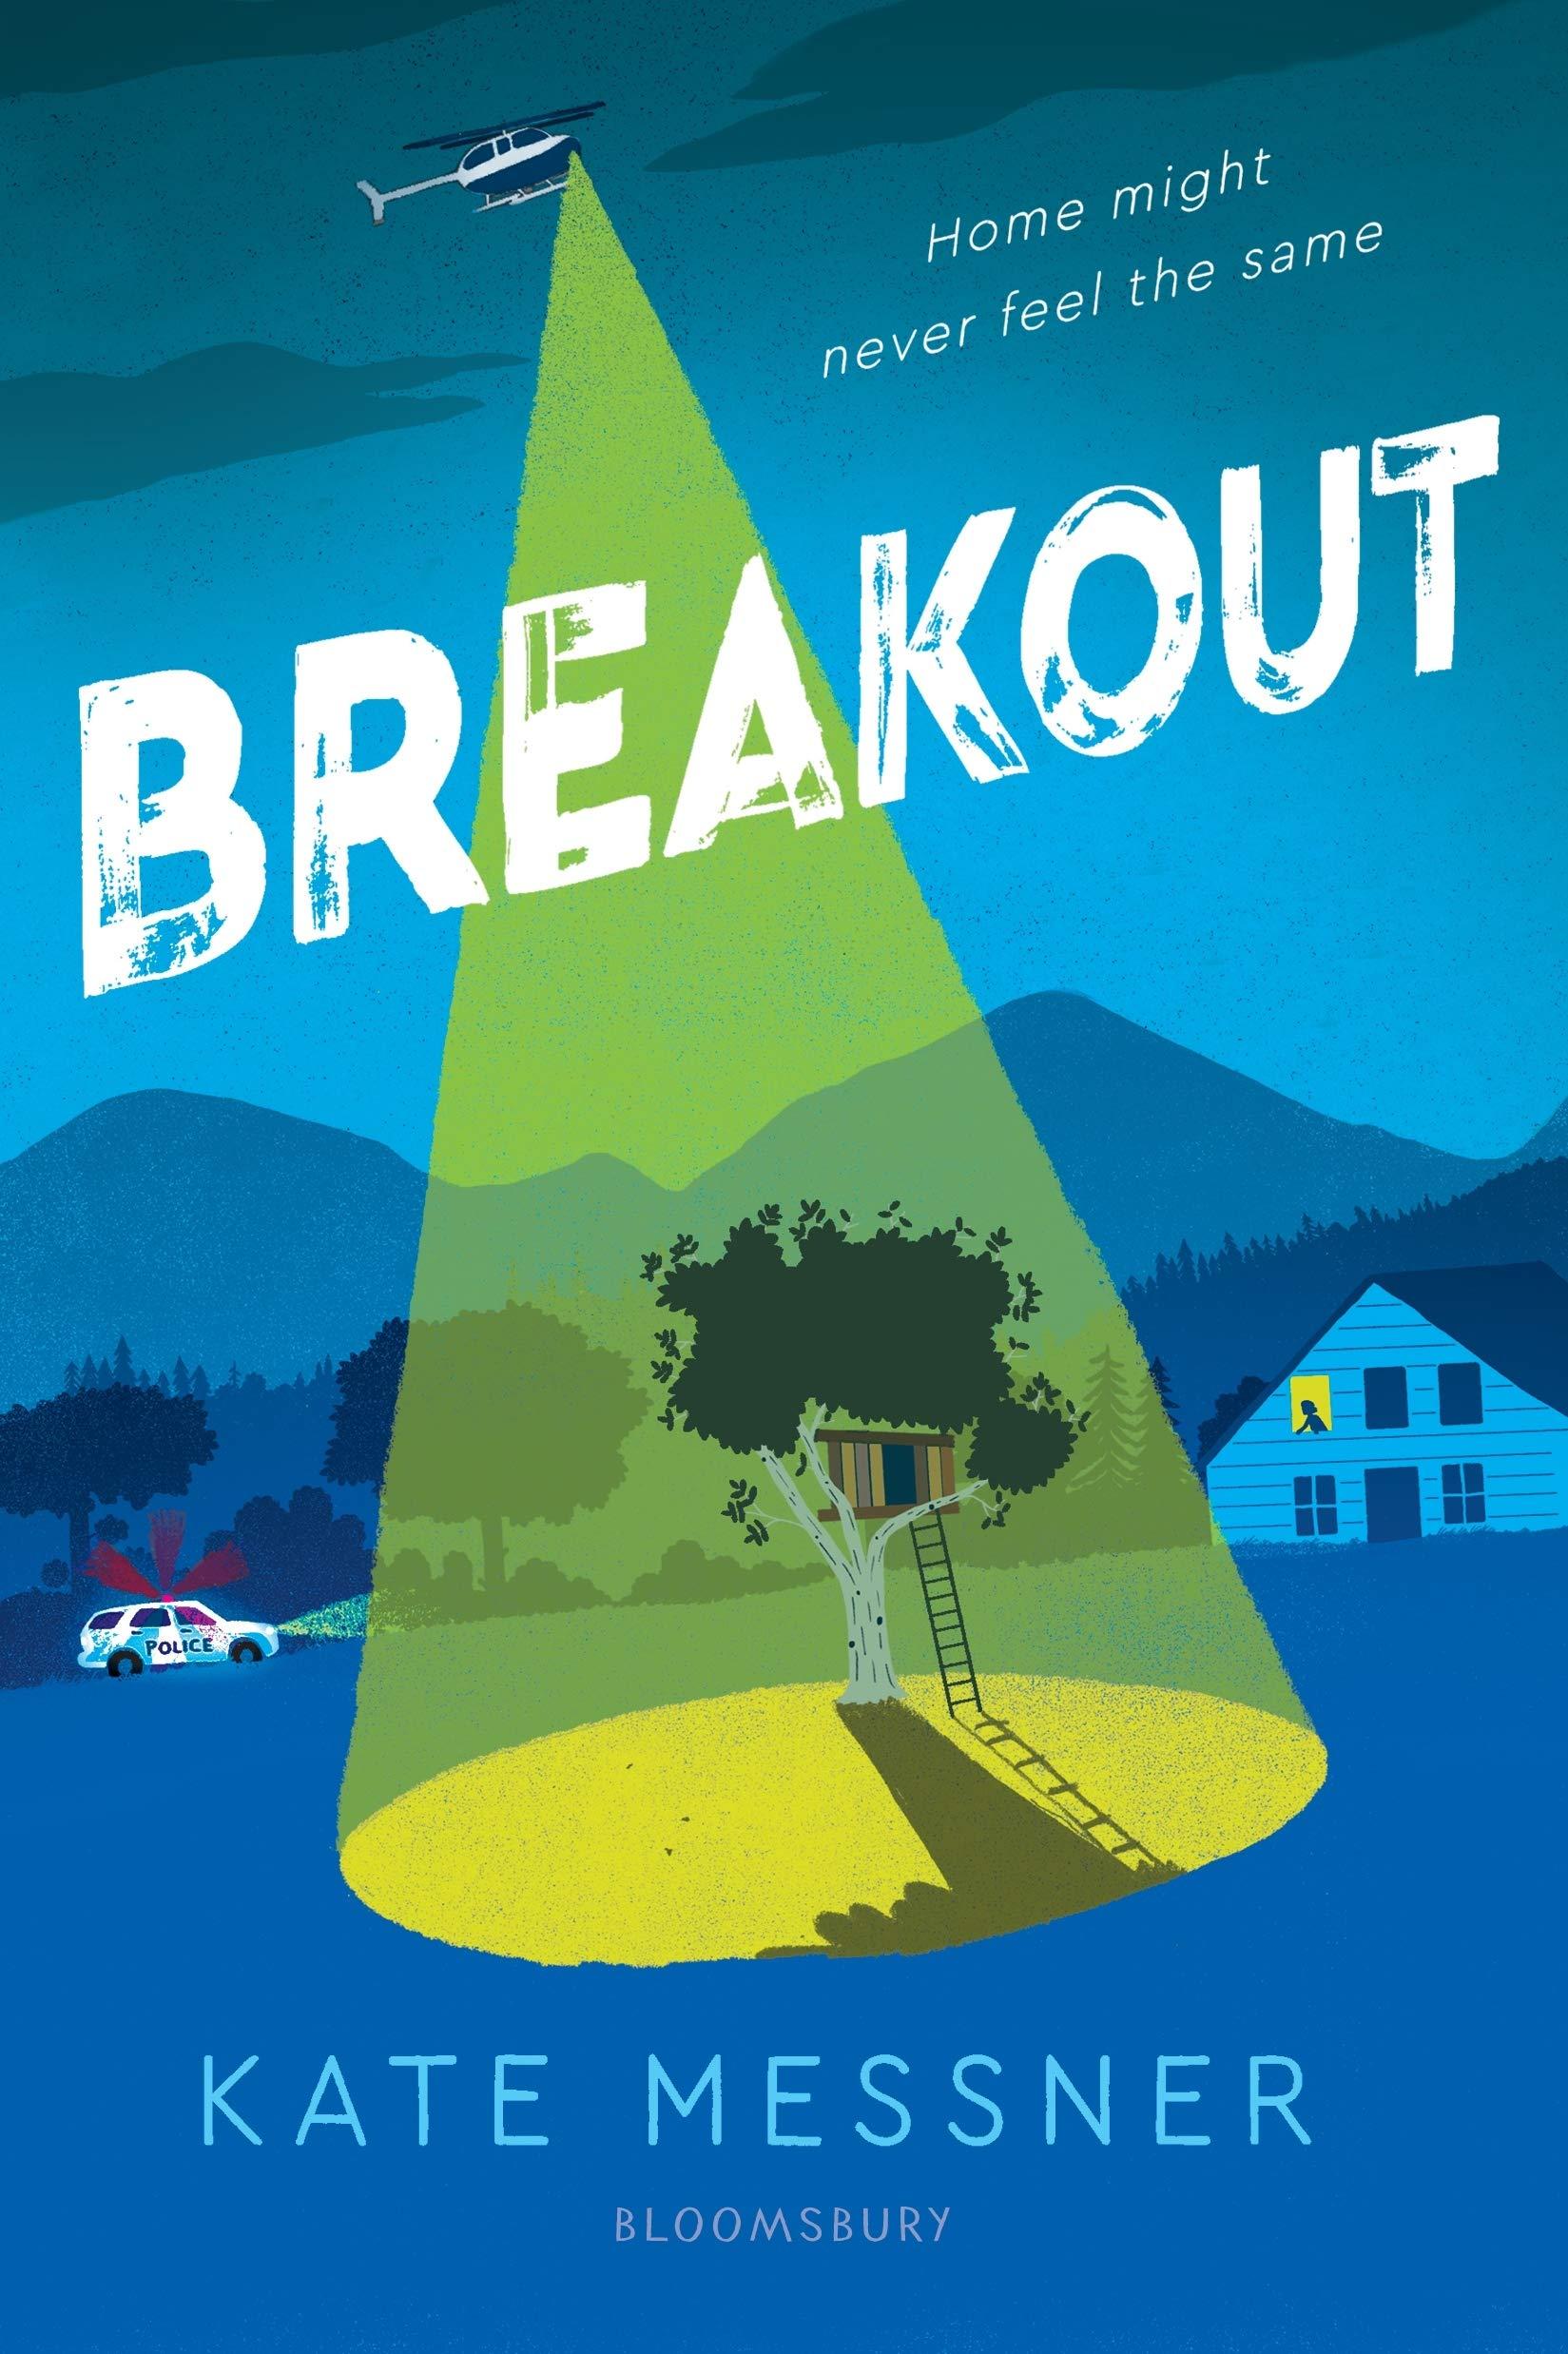 Breakout Kate Messner